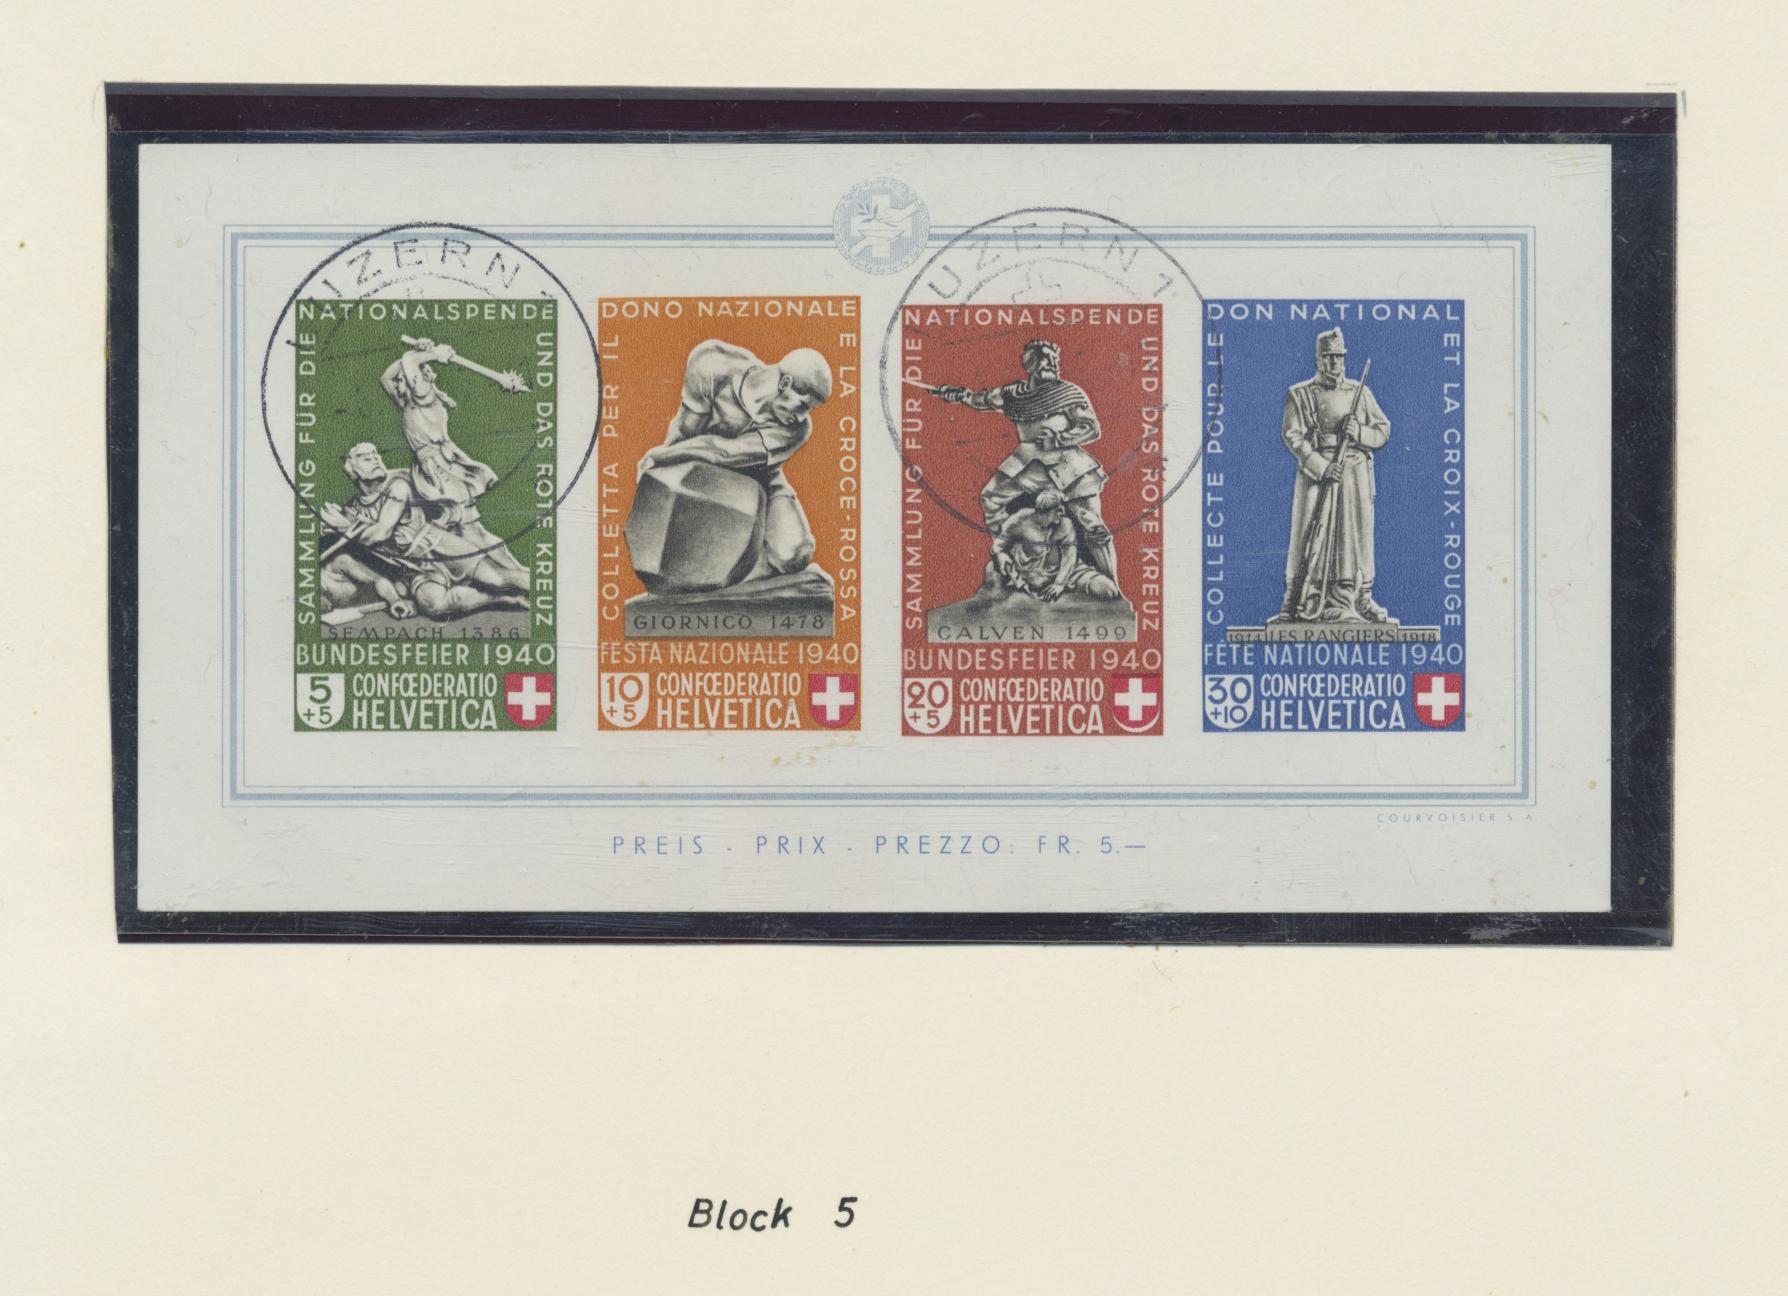 Lot 23127 - schweiz  -  Auktionshaus Christoph Gärtner GmbH & Co. KG Sale #47 Collections: Overseas, Thematics, Europe